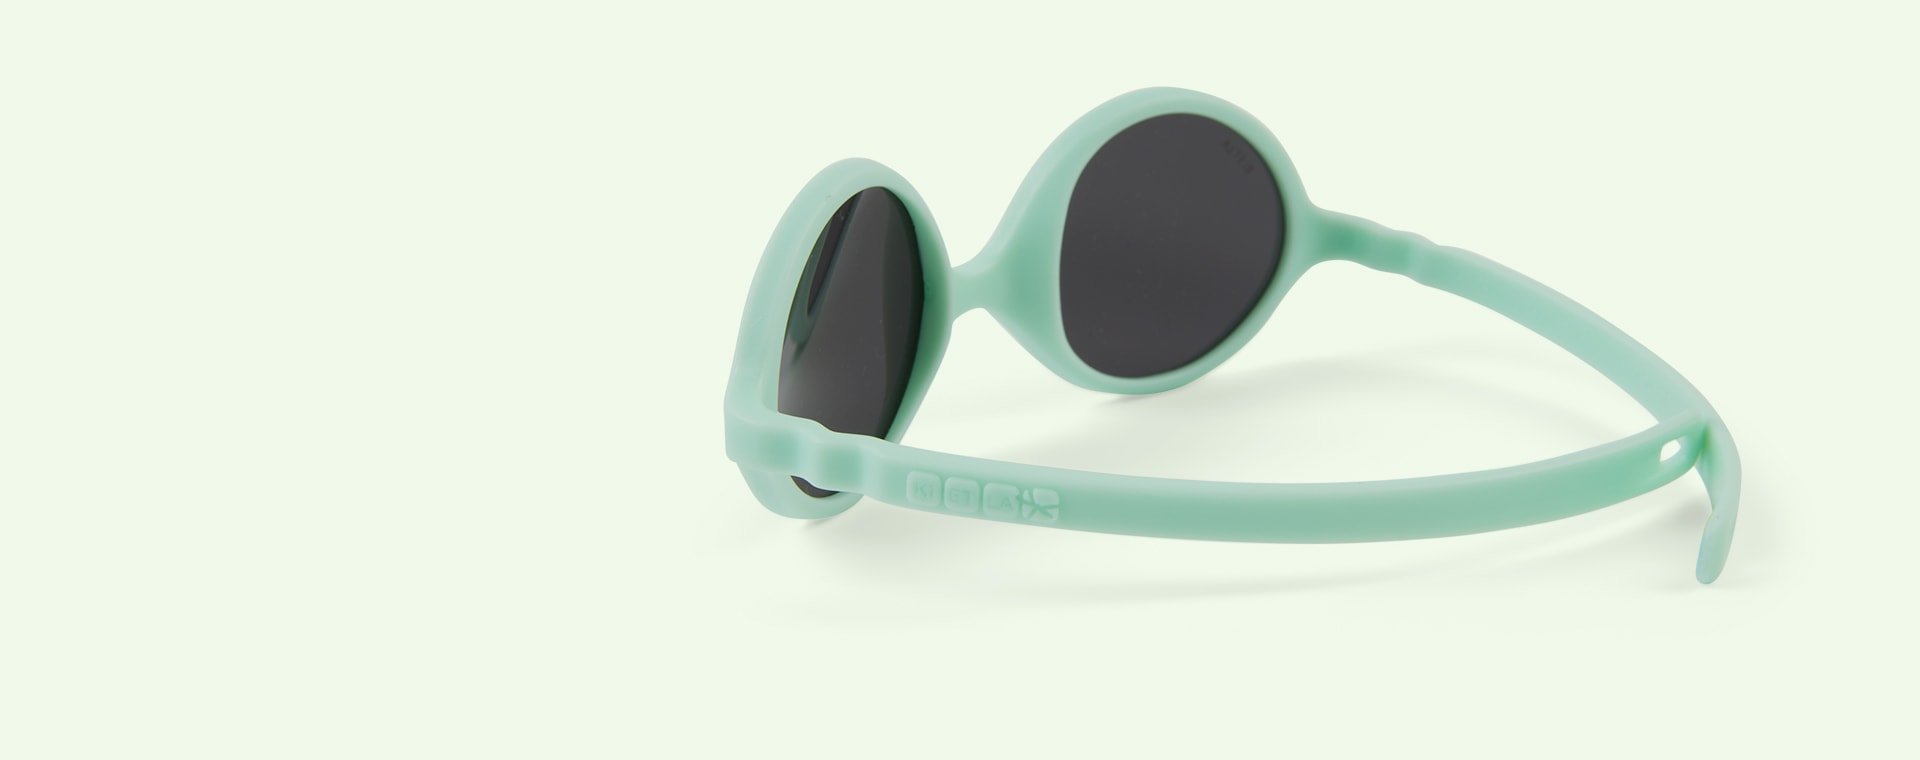 Aqua Ki ET LA Diabola Sunglasses v2